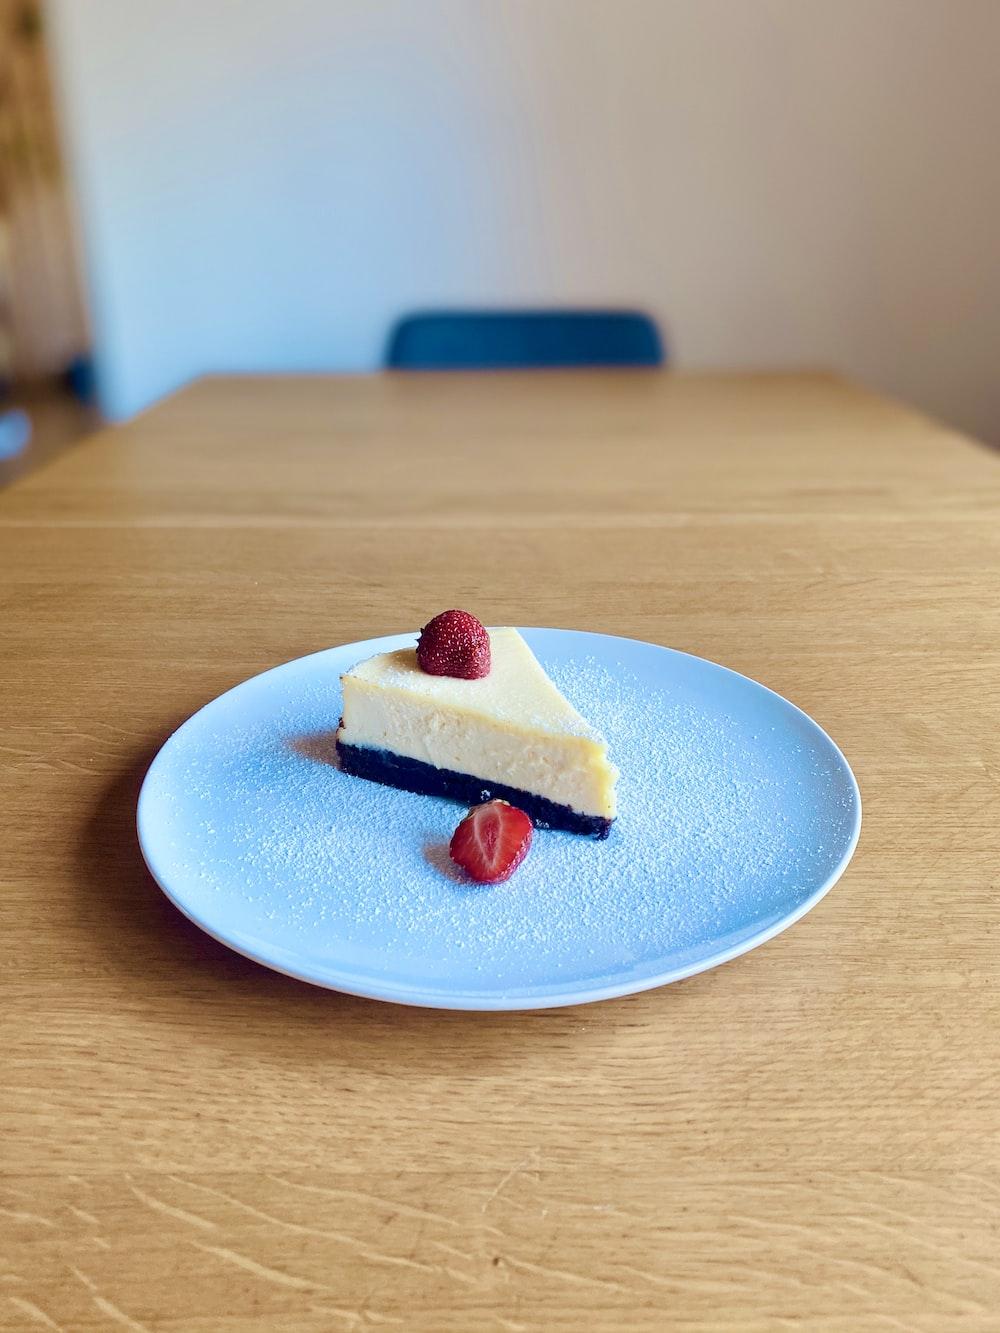 strawberry cake on white ceramic plate